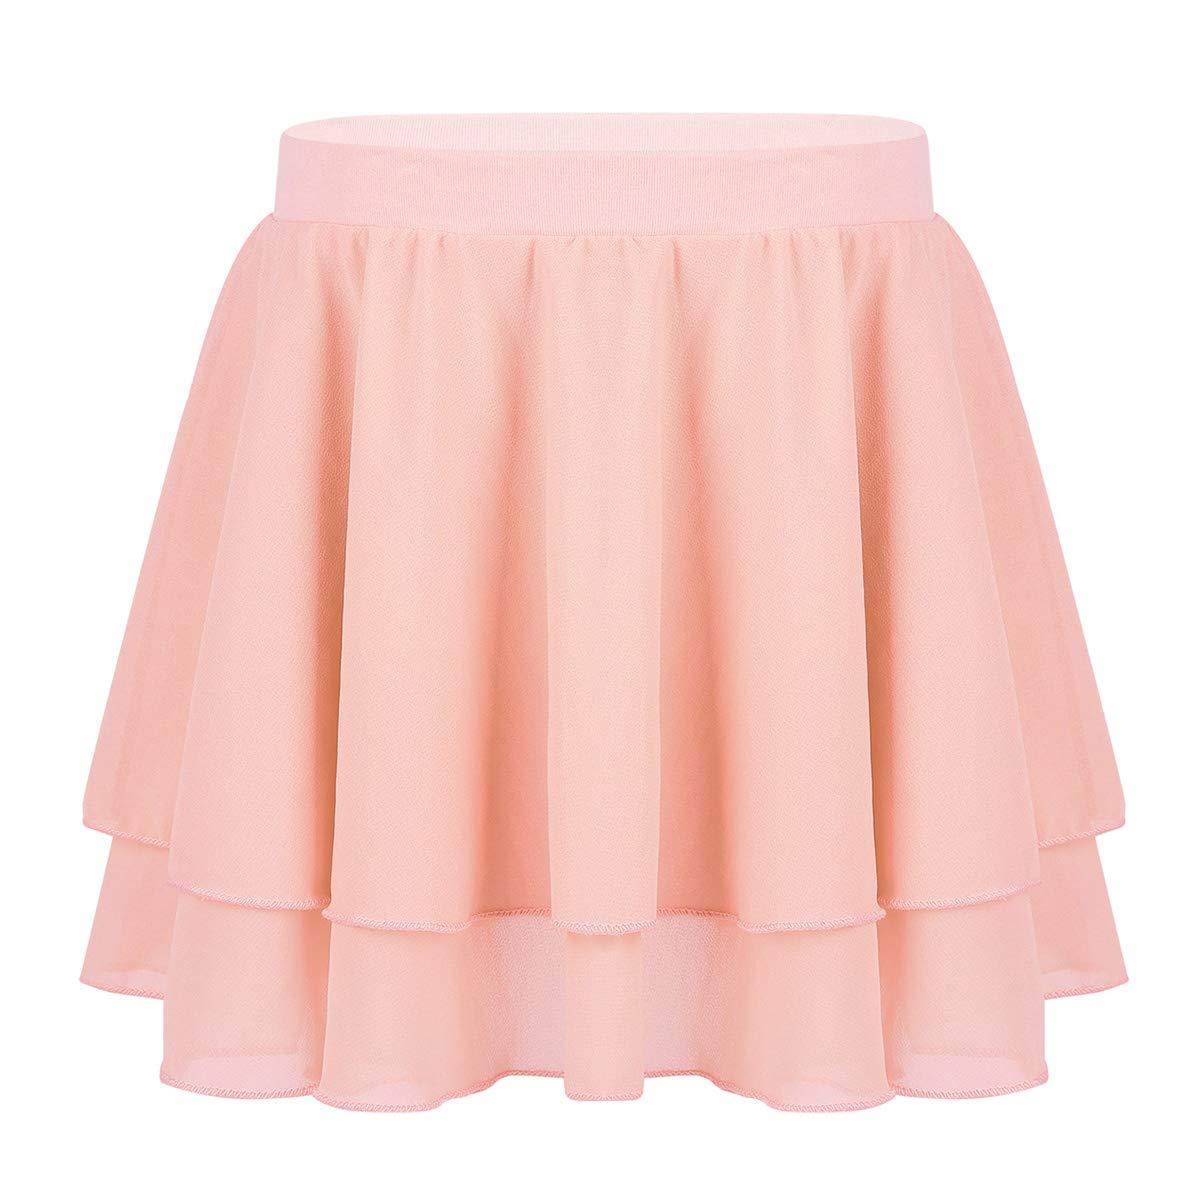 inlzdz Kids Girls Ballet Dance Classic Chiffon Pleated Skirt Pull-On Leotard Tutu Skirt Dancewear Costumes